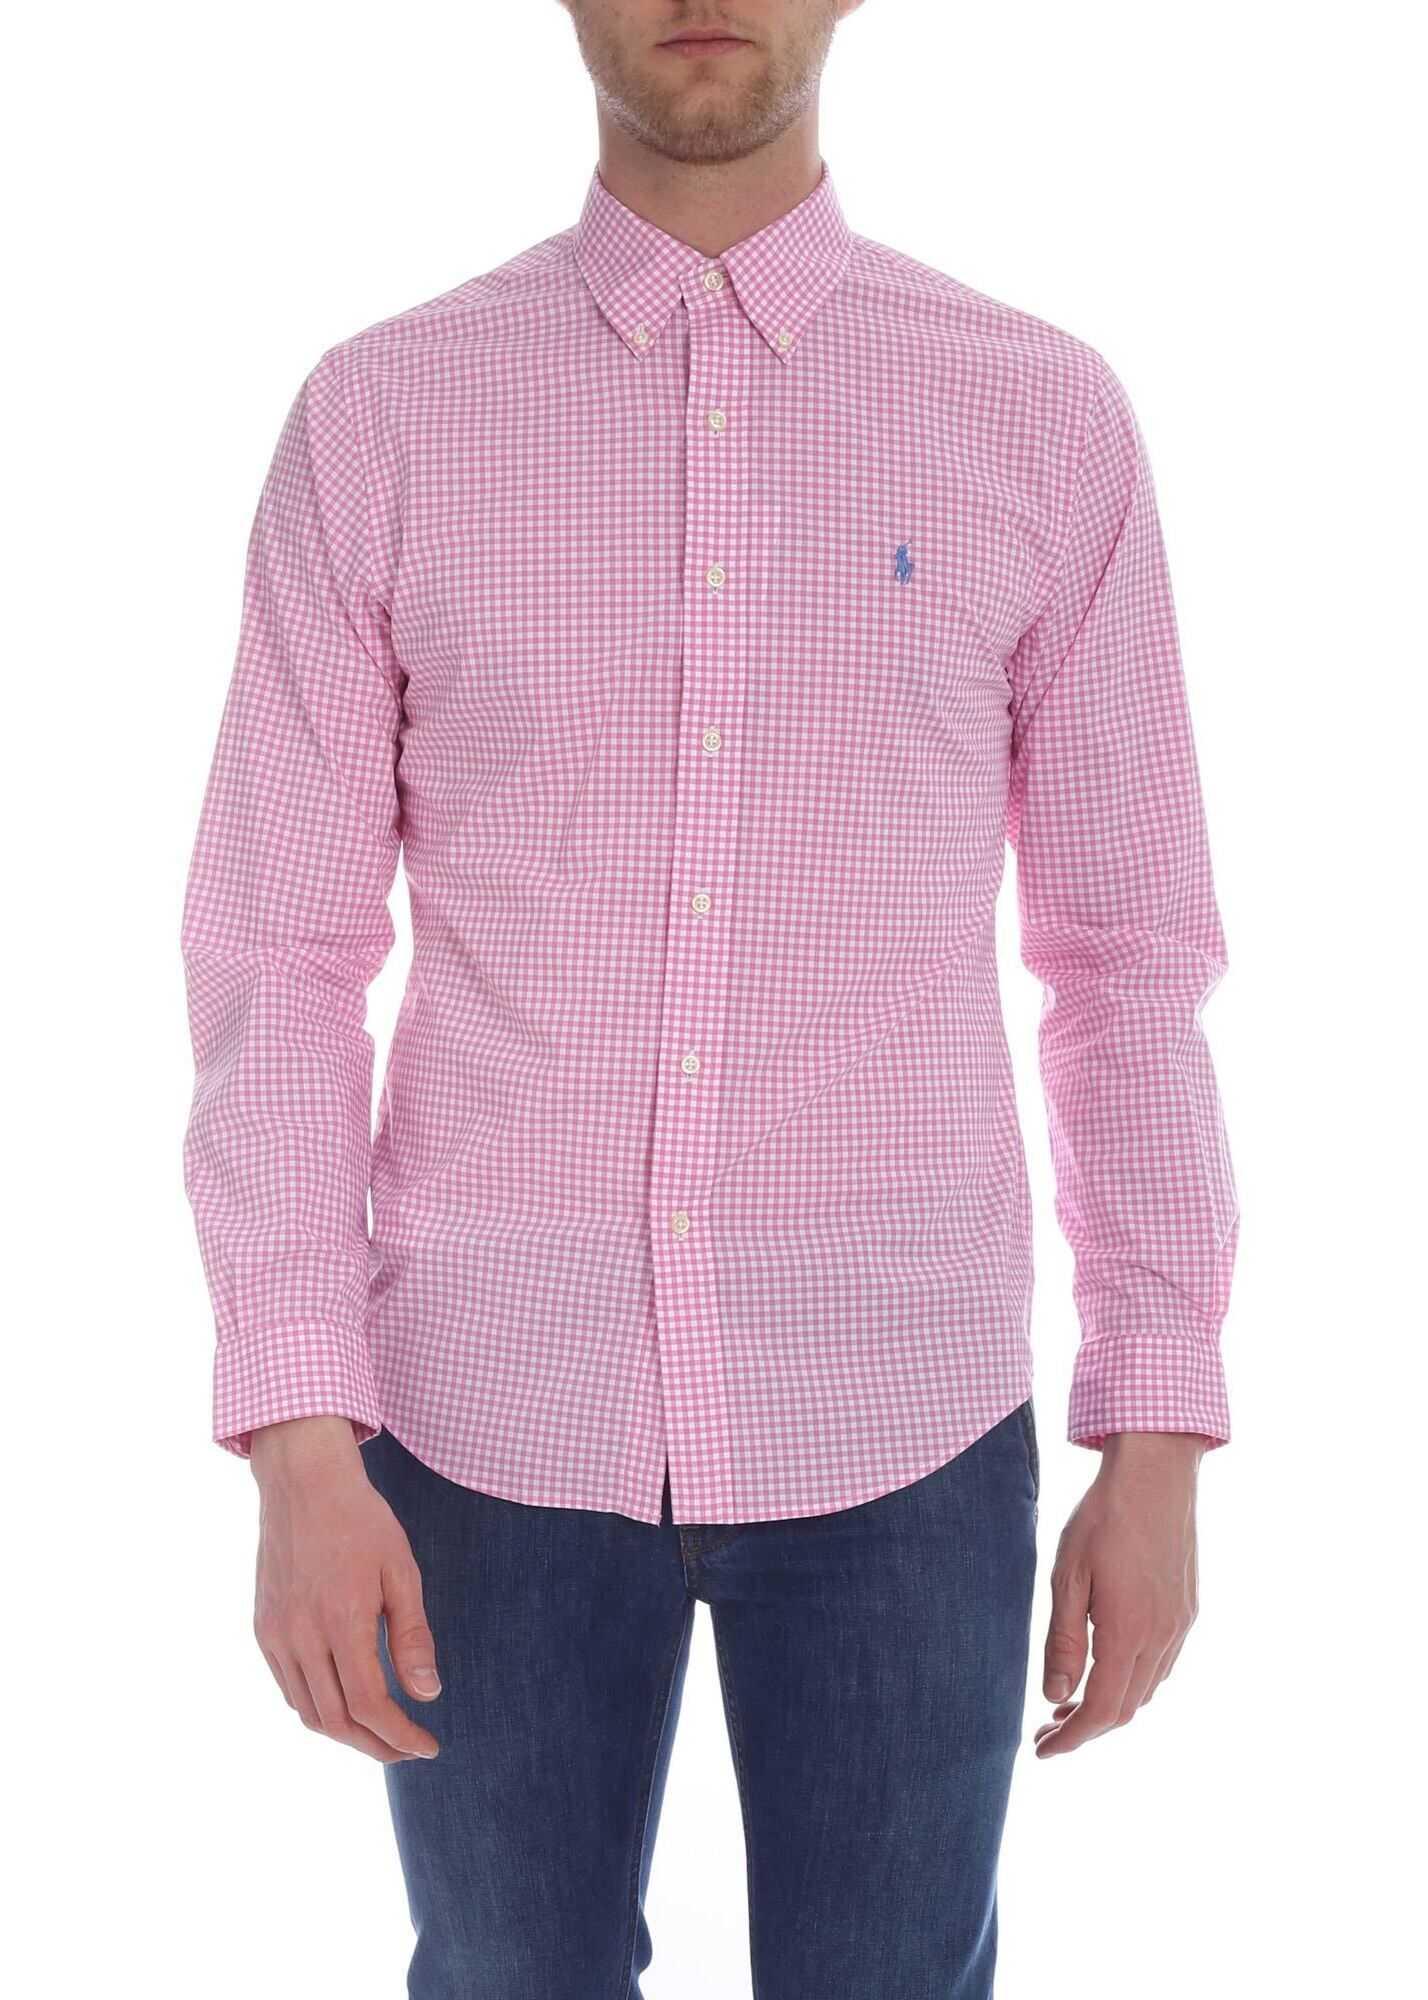 Ralph Lauren White And Pink Checked Shirt Pink imagine